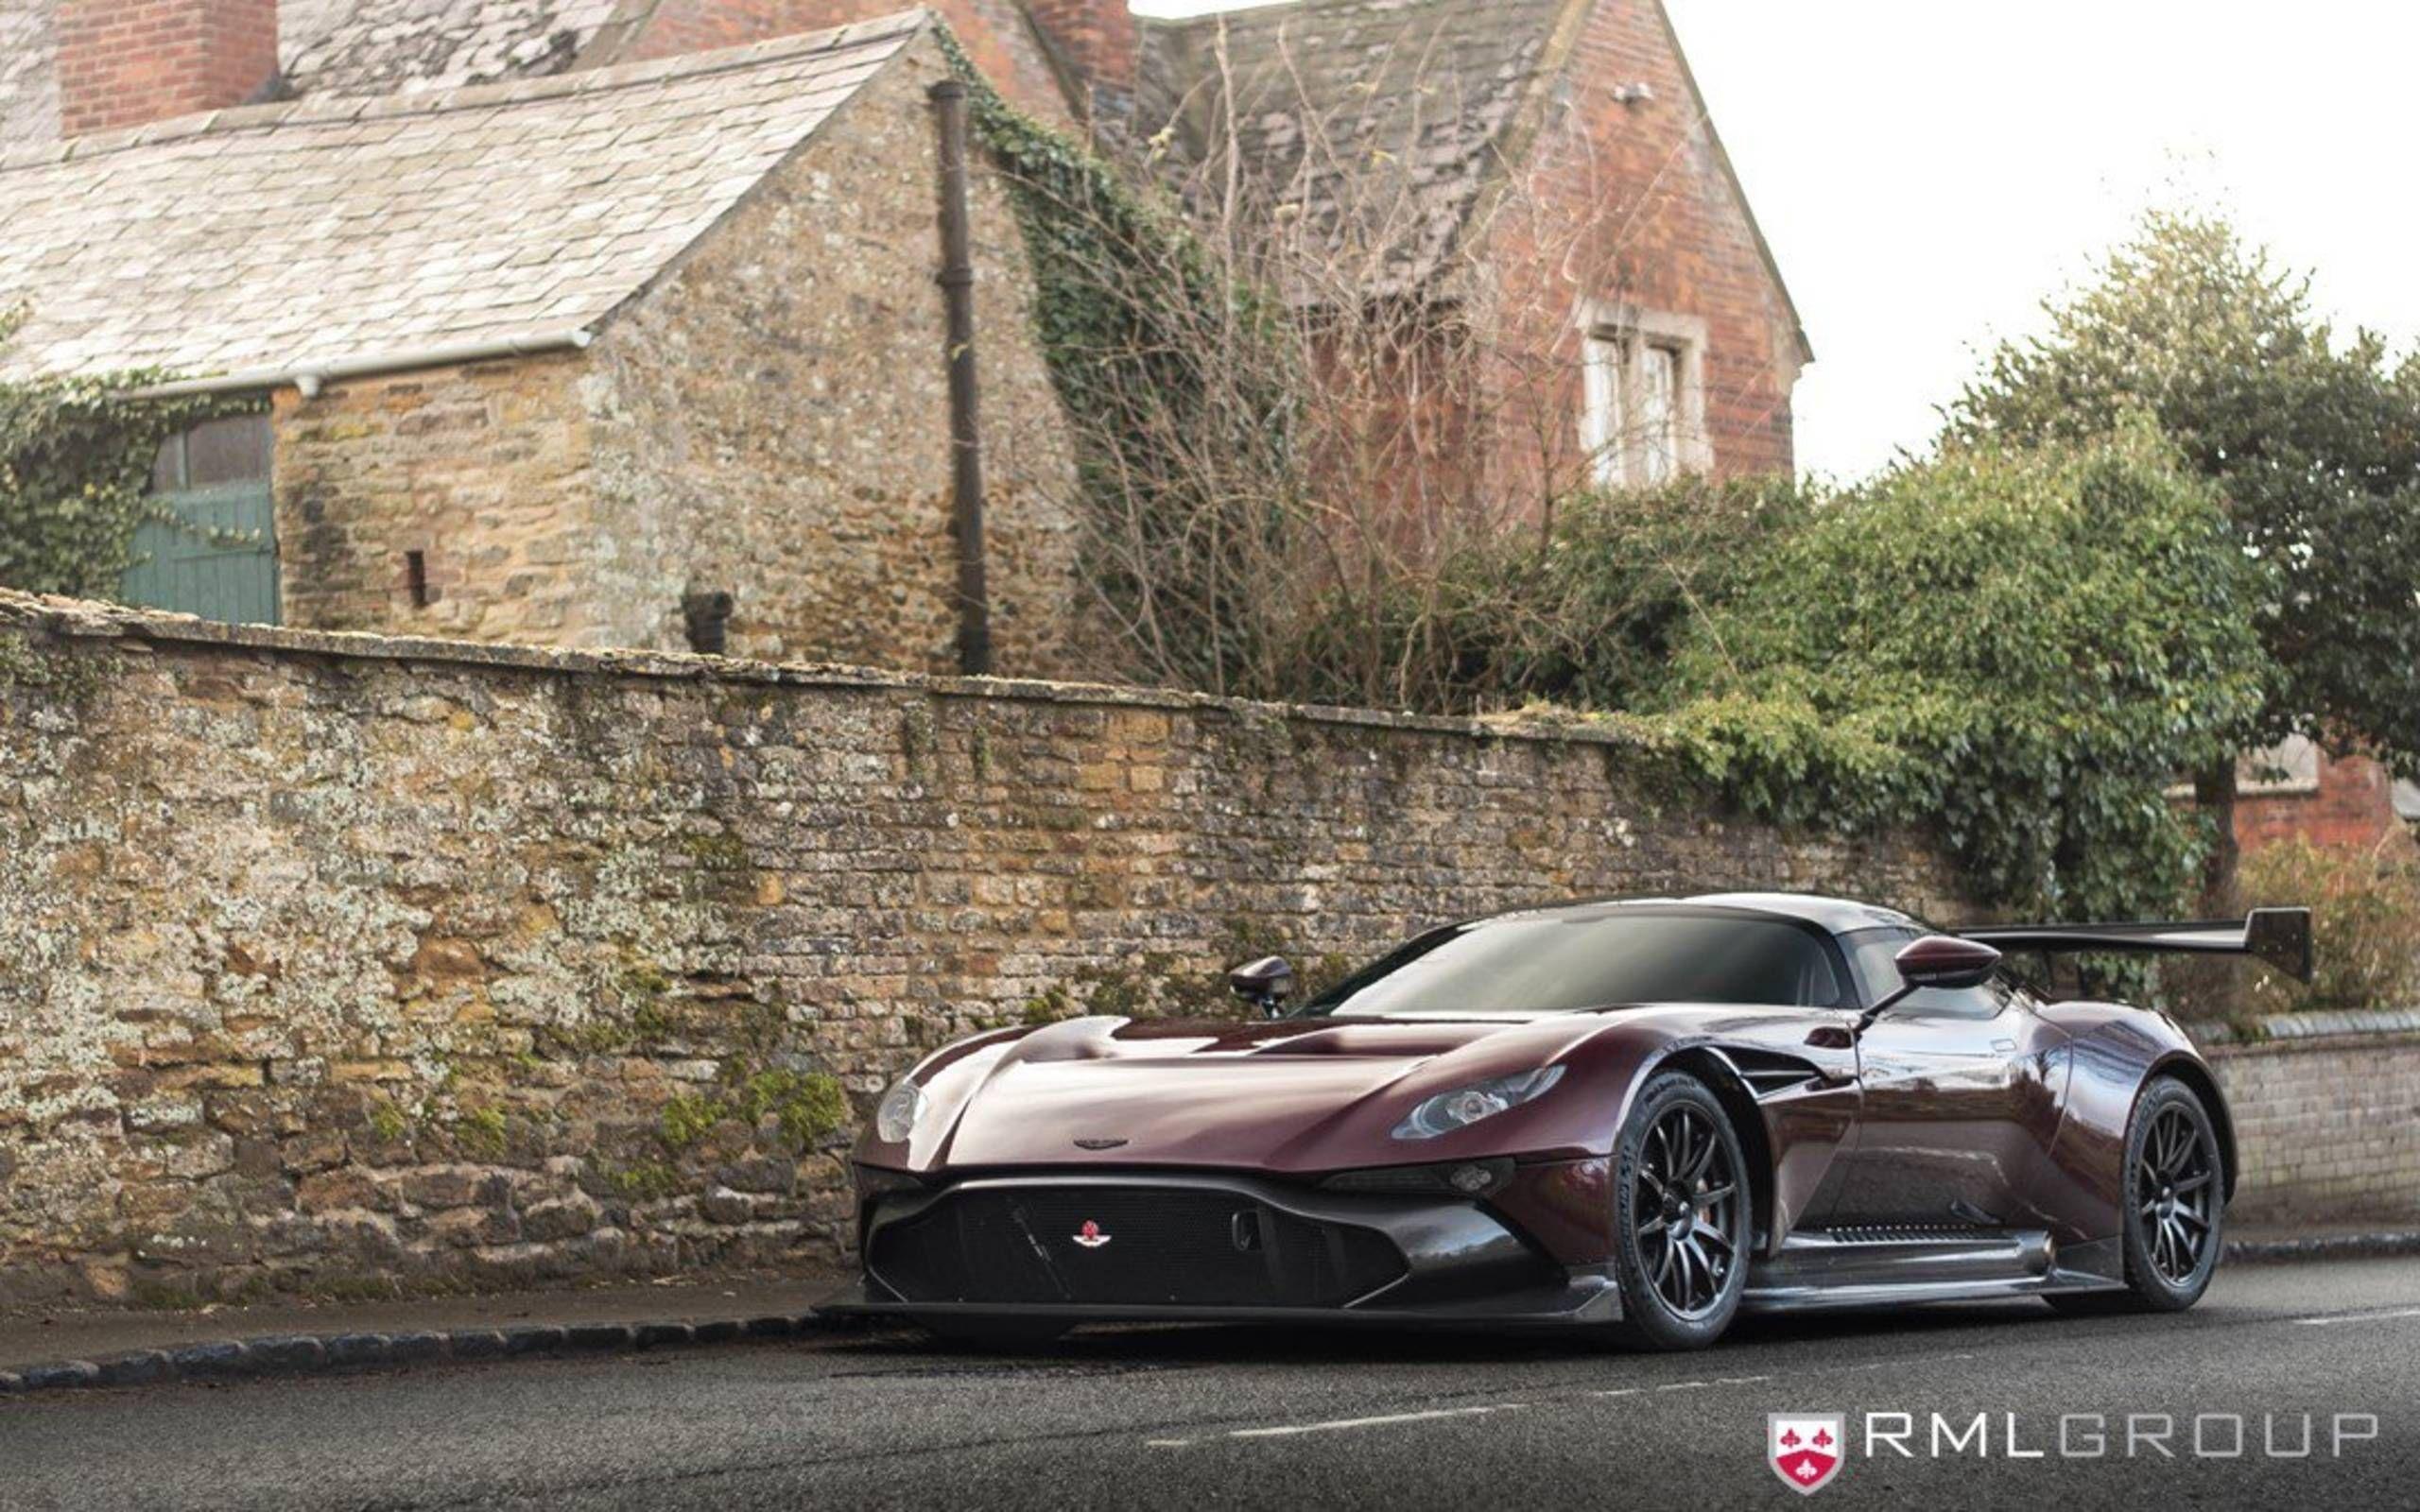 World S First Aston Martin Vulcan Made Street Legal In Rml Group Conversion